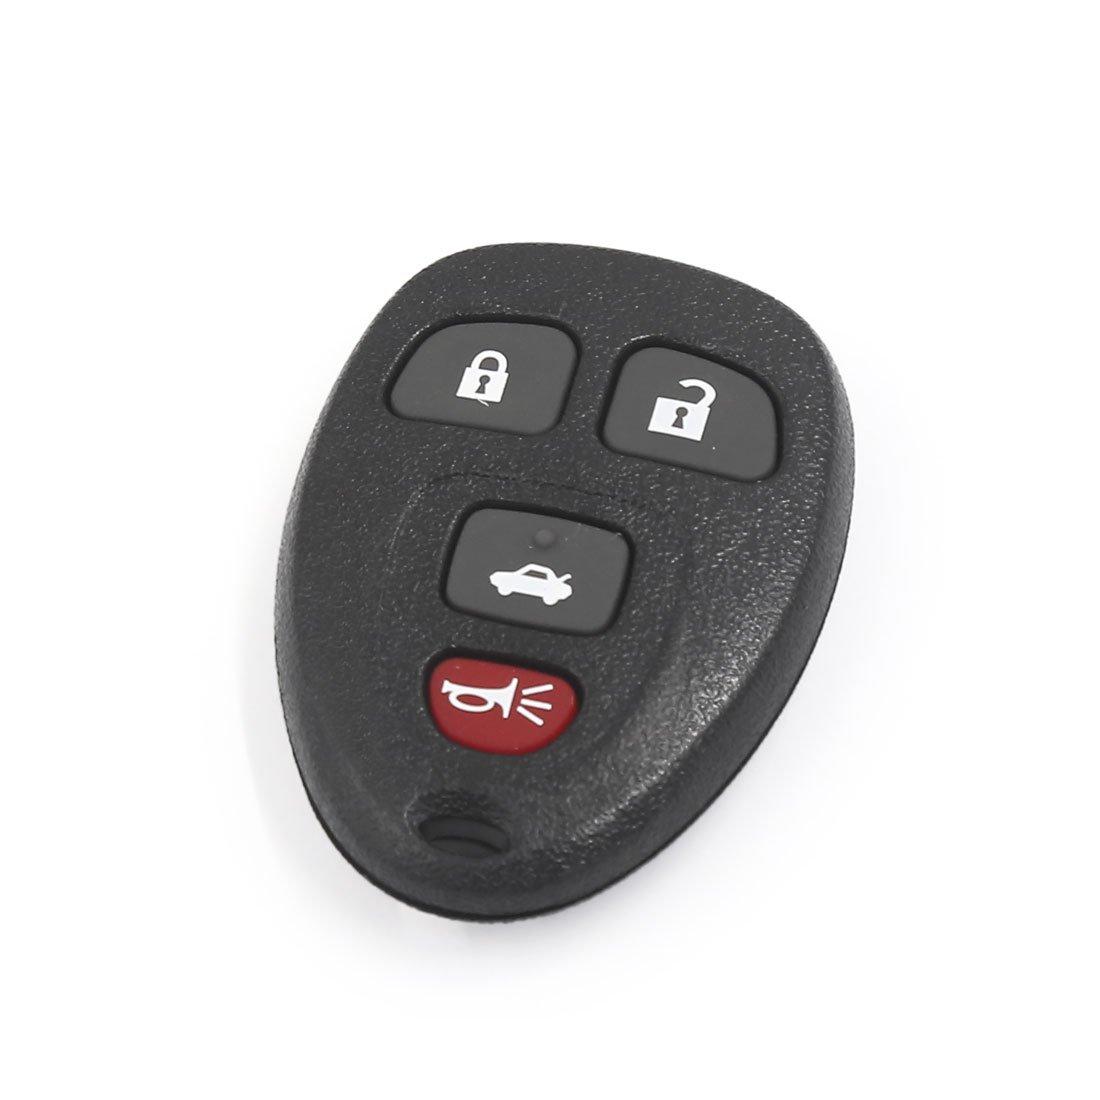 BEESCLOVER Car Key Fob for Lacrosse Cobalt Malibu Grand Prix G6 Solstice Models 22733523